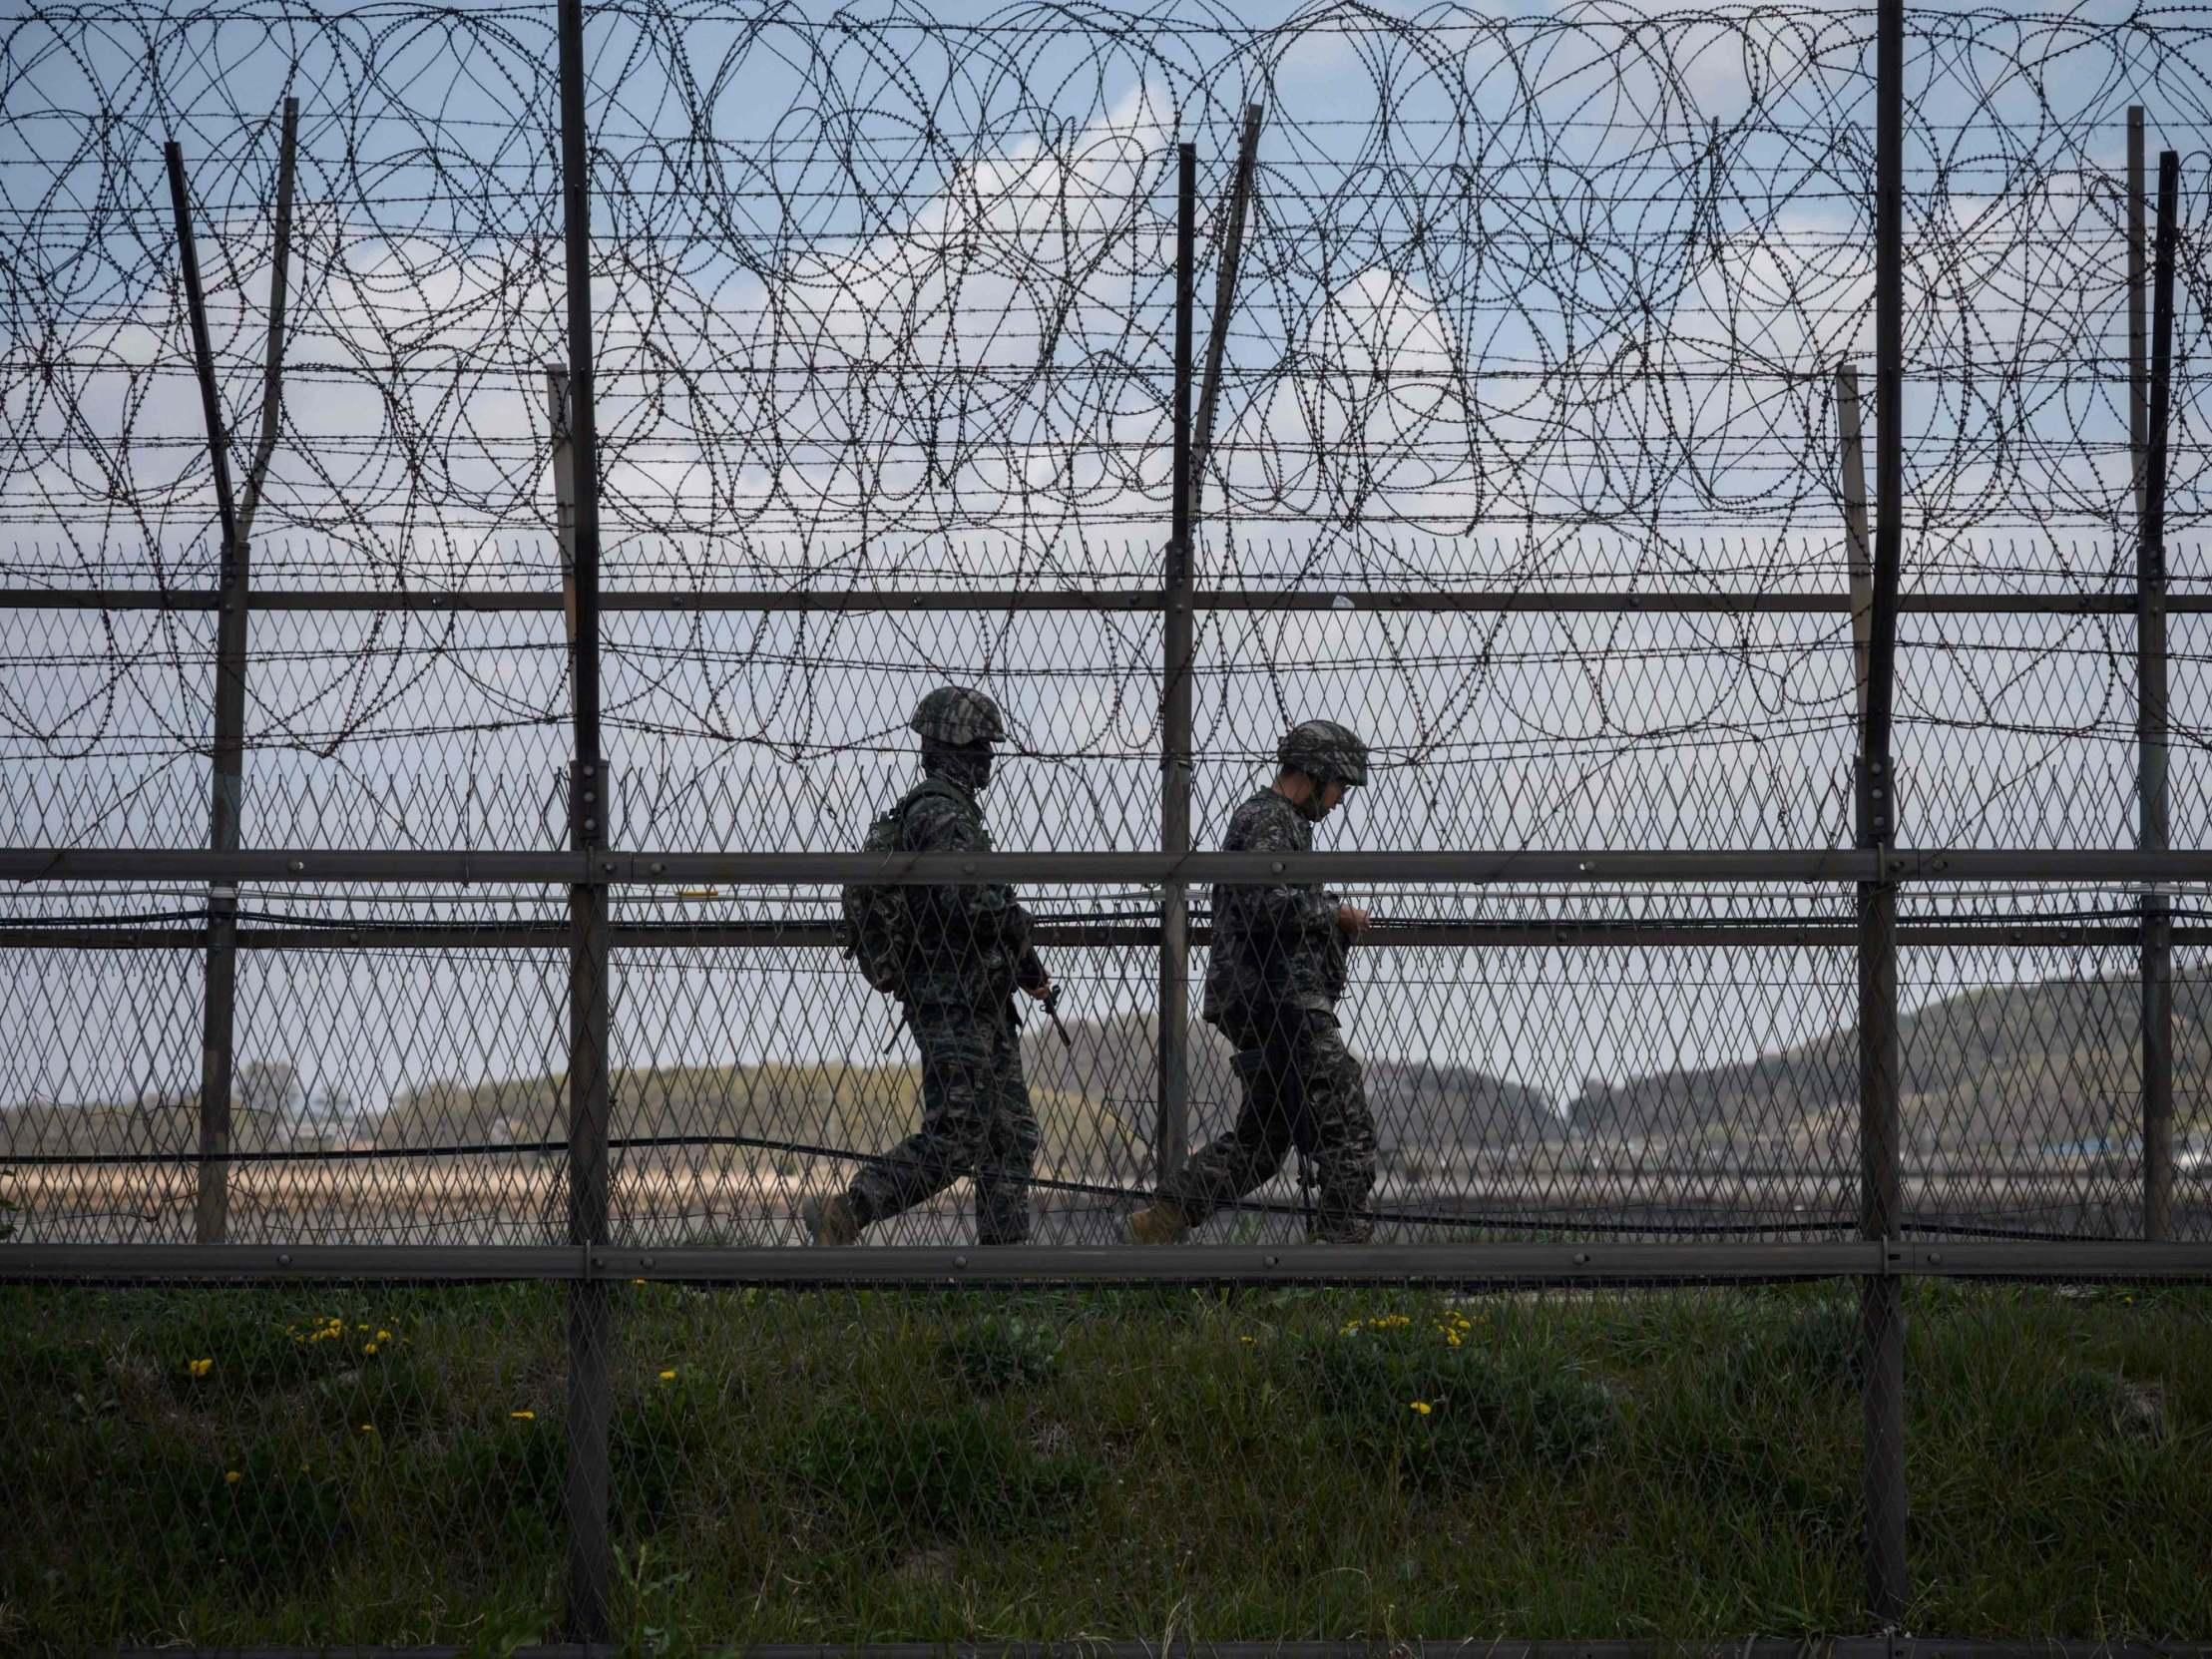 North and South Korea exchange gunfire across DMZ border area photo